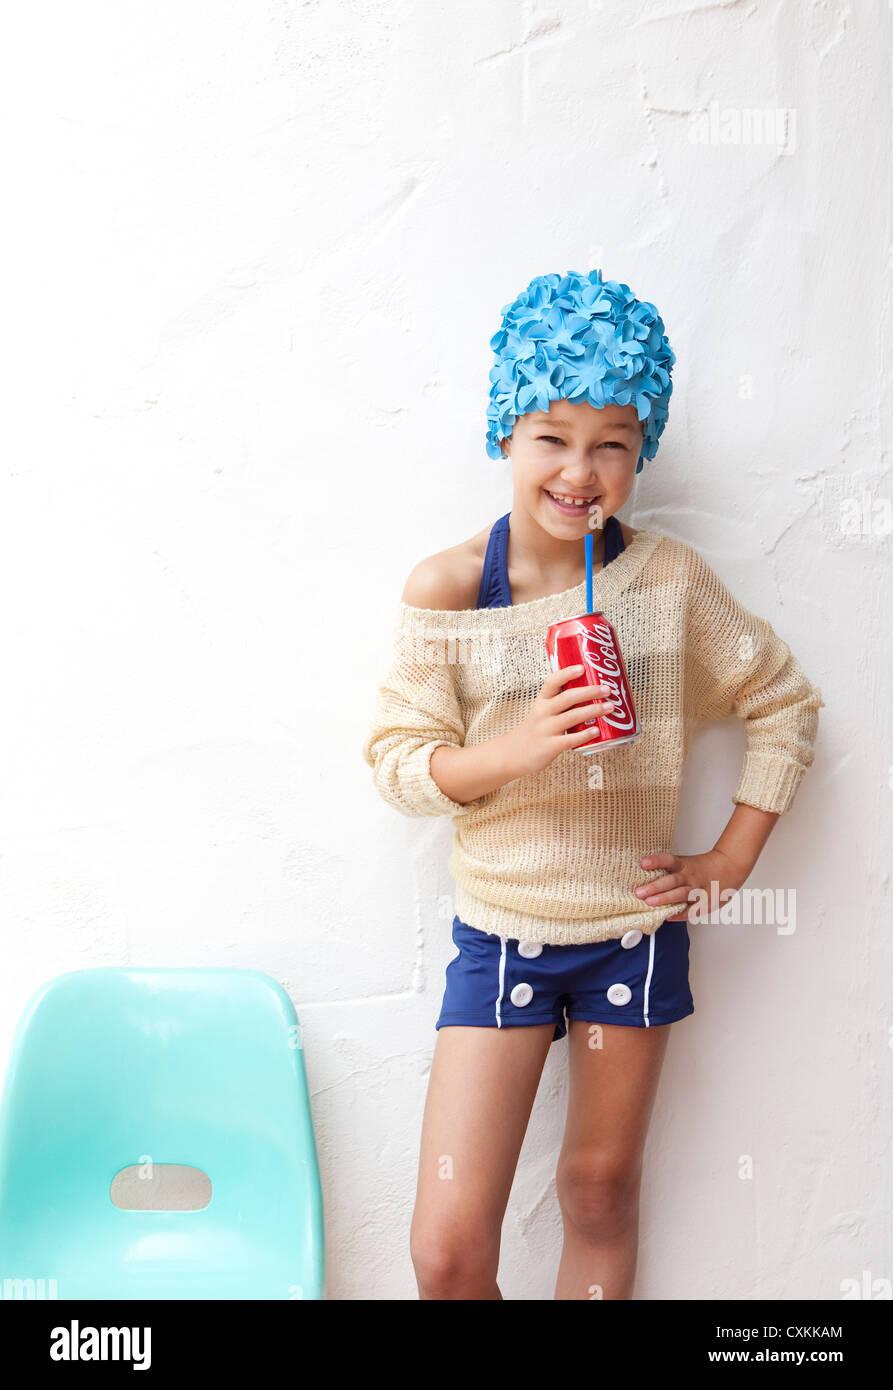 Girl in bathing suit drinking soda - Stock Image